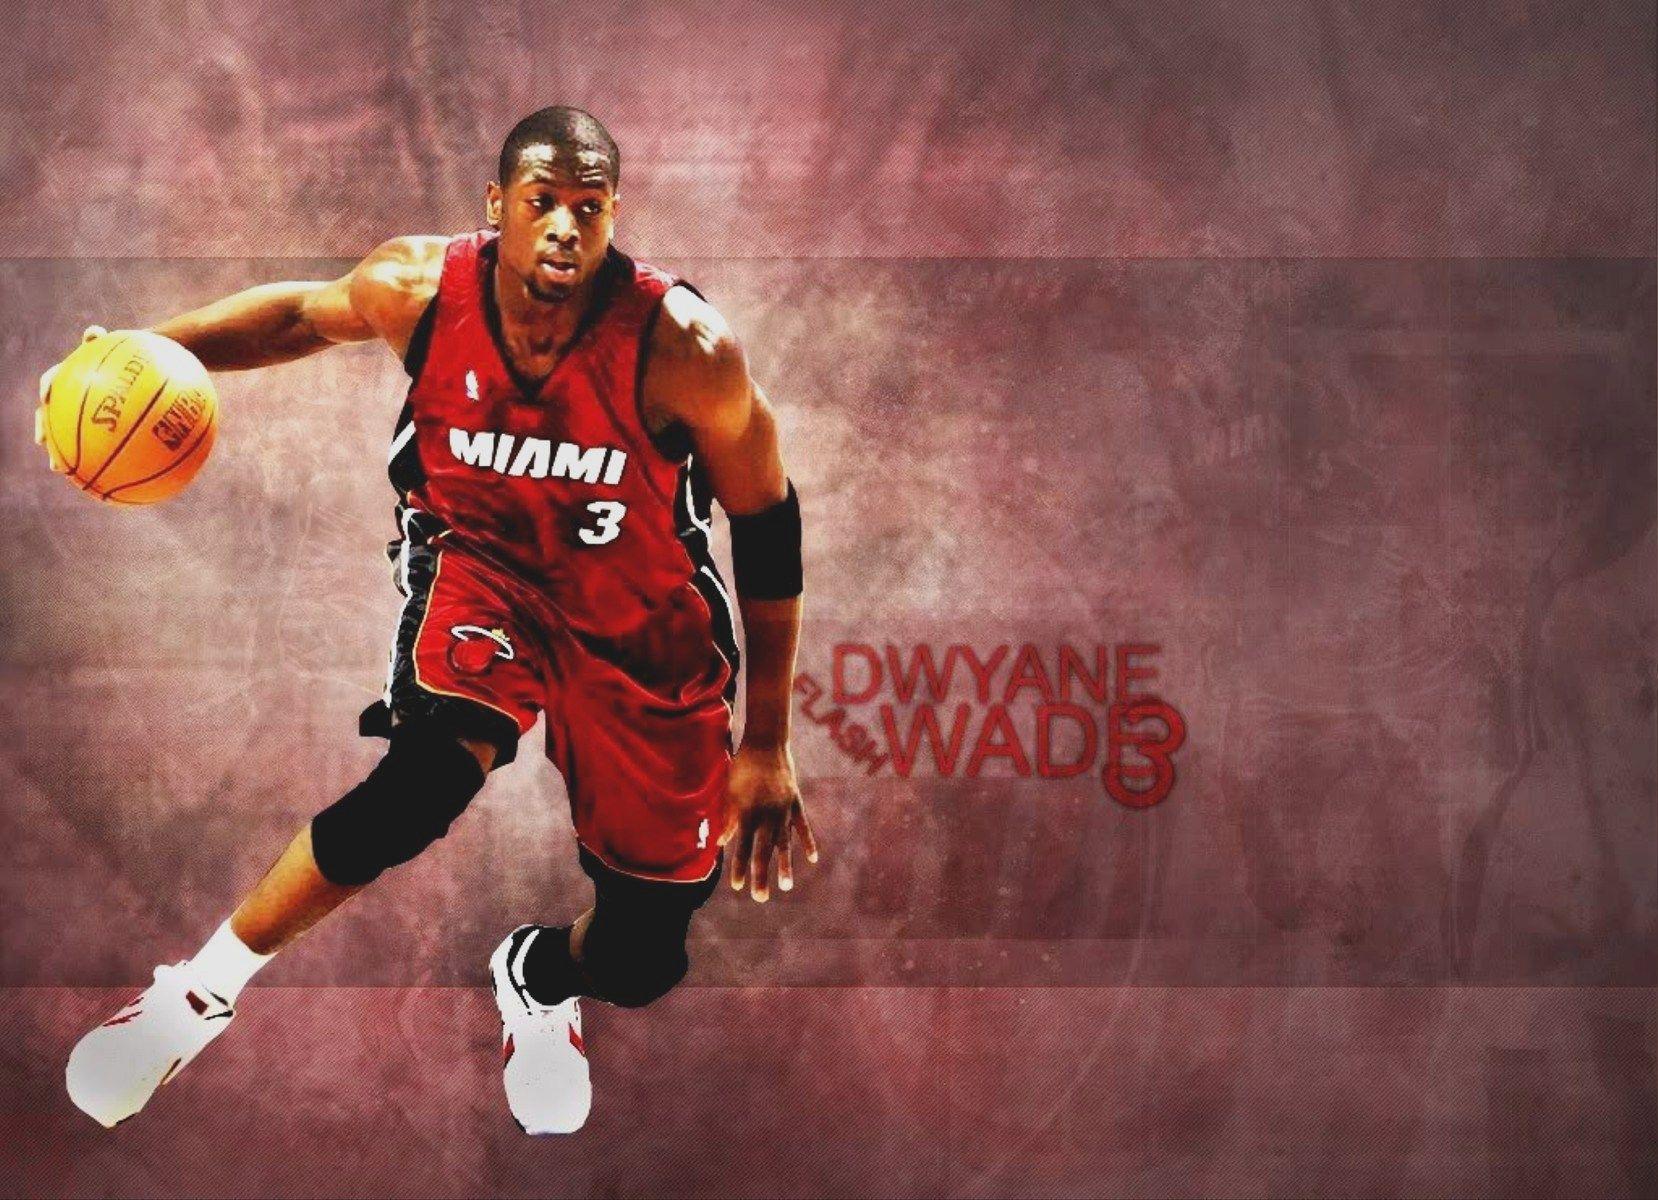 Dwyane Wade 2015 Basketball Players Dwyane Wade 2015 Miami Heat 1658x1200